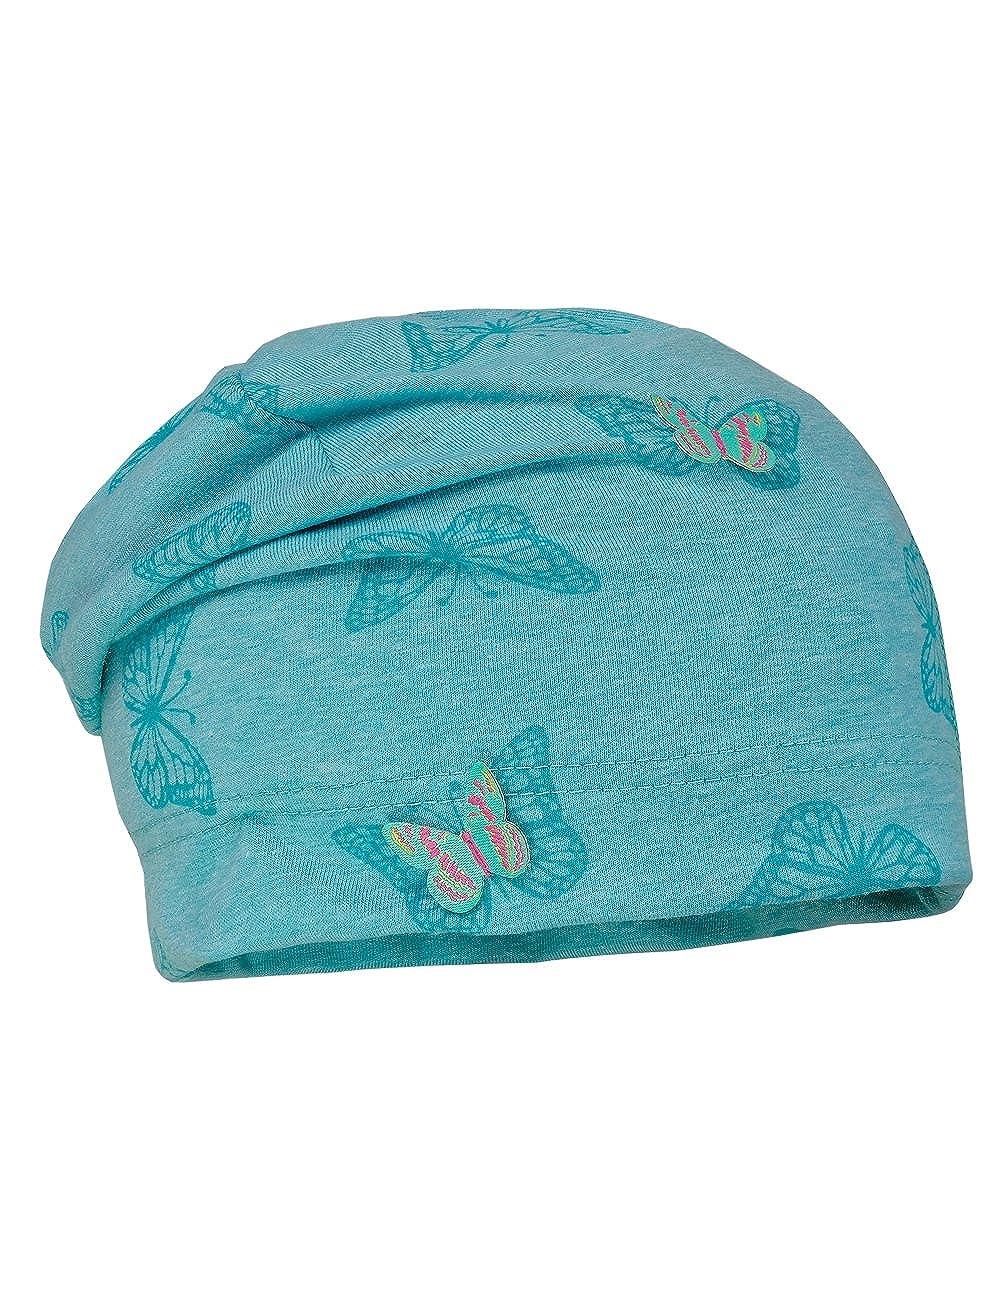 maximo Beanie, Melangejersey Bedruckt, Bonnet Bébé Fille, Multicolore (Porzellan-Schmetterling/Porz-Punkte 3638), 49 83500-997500